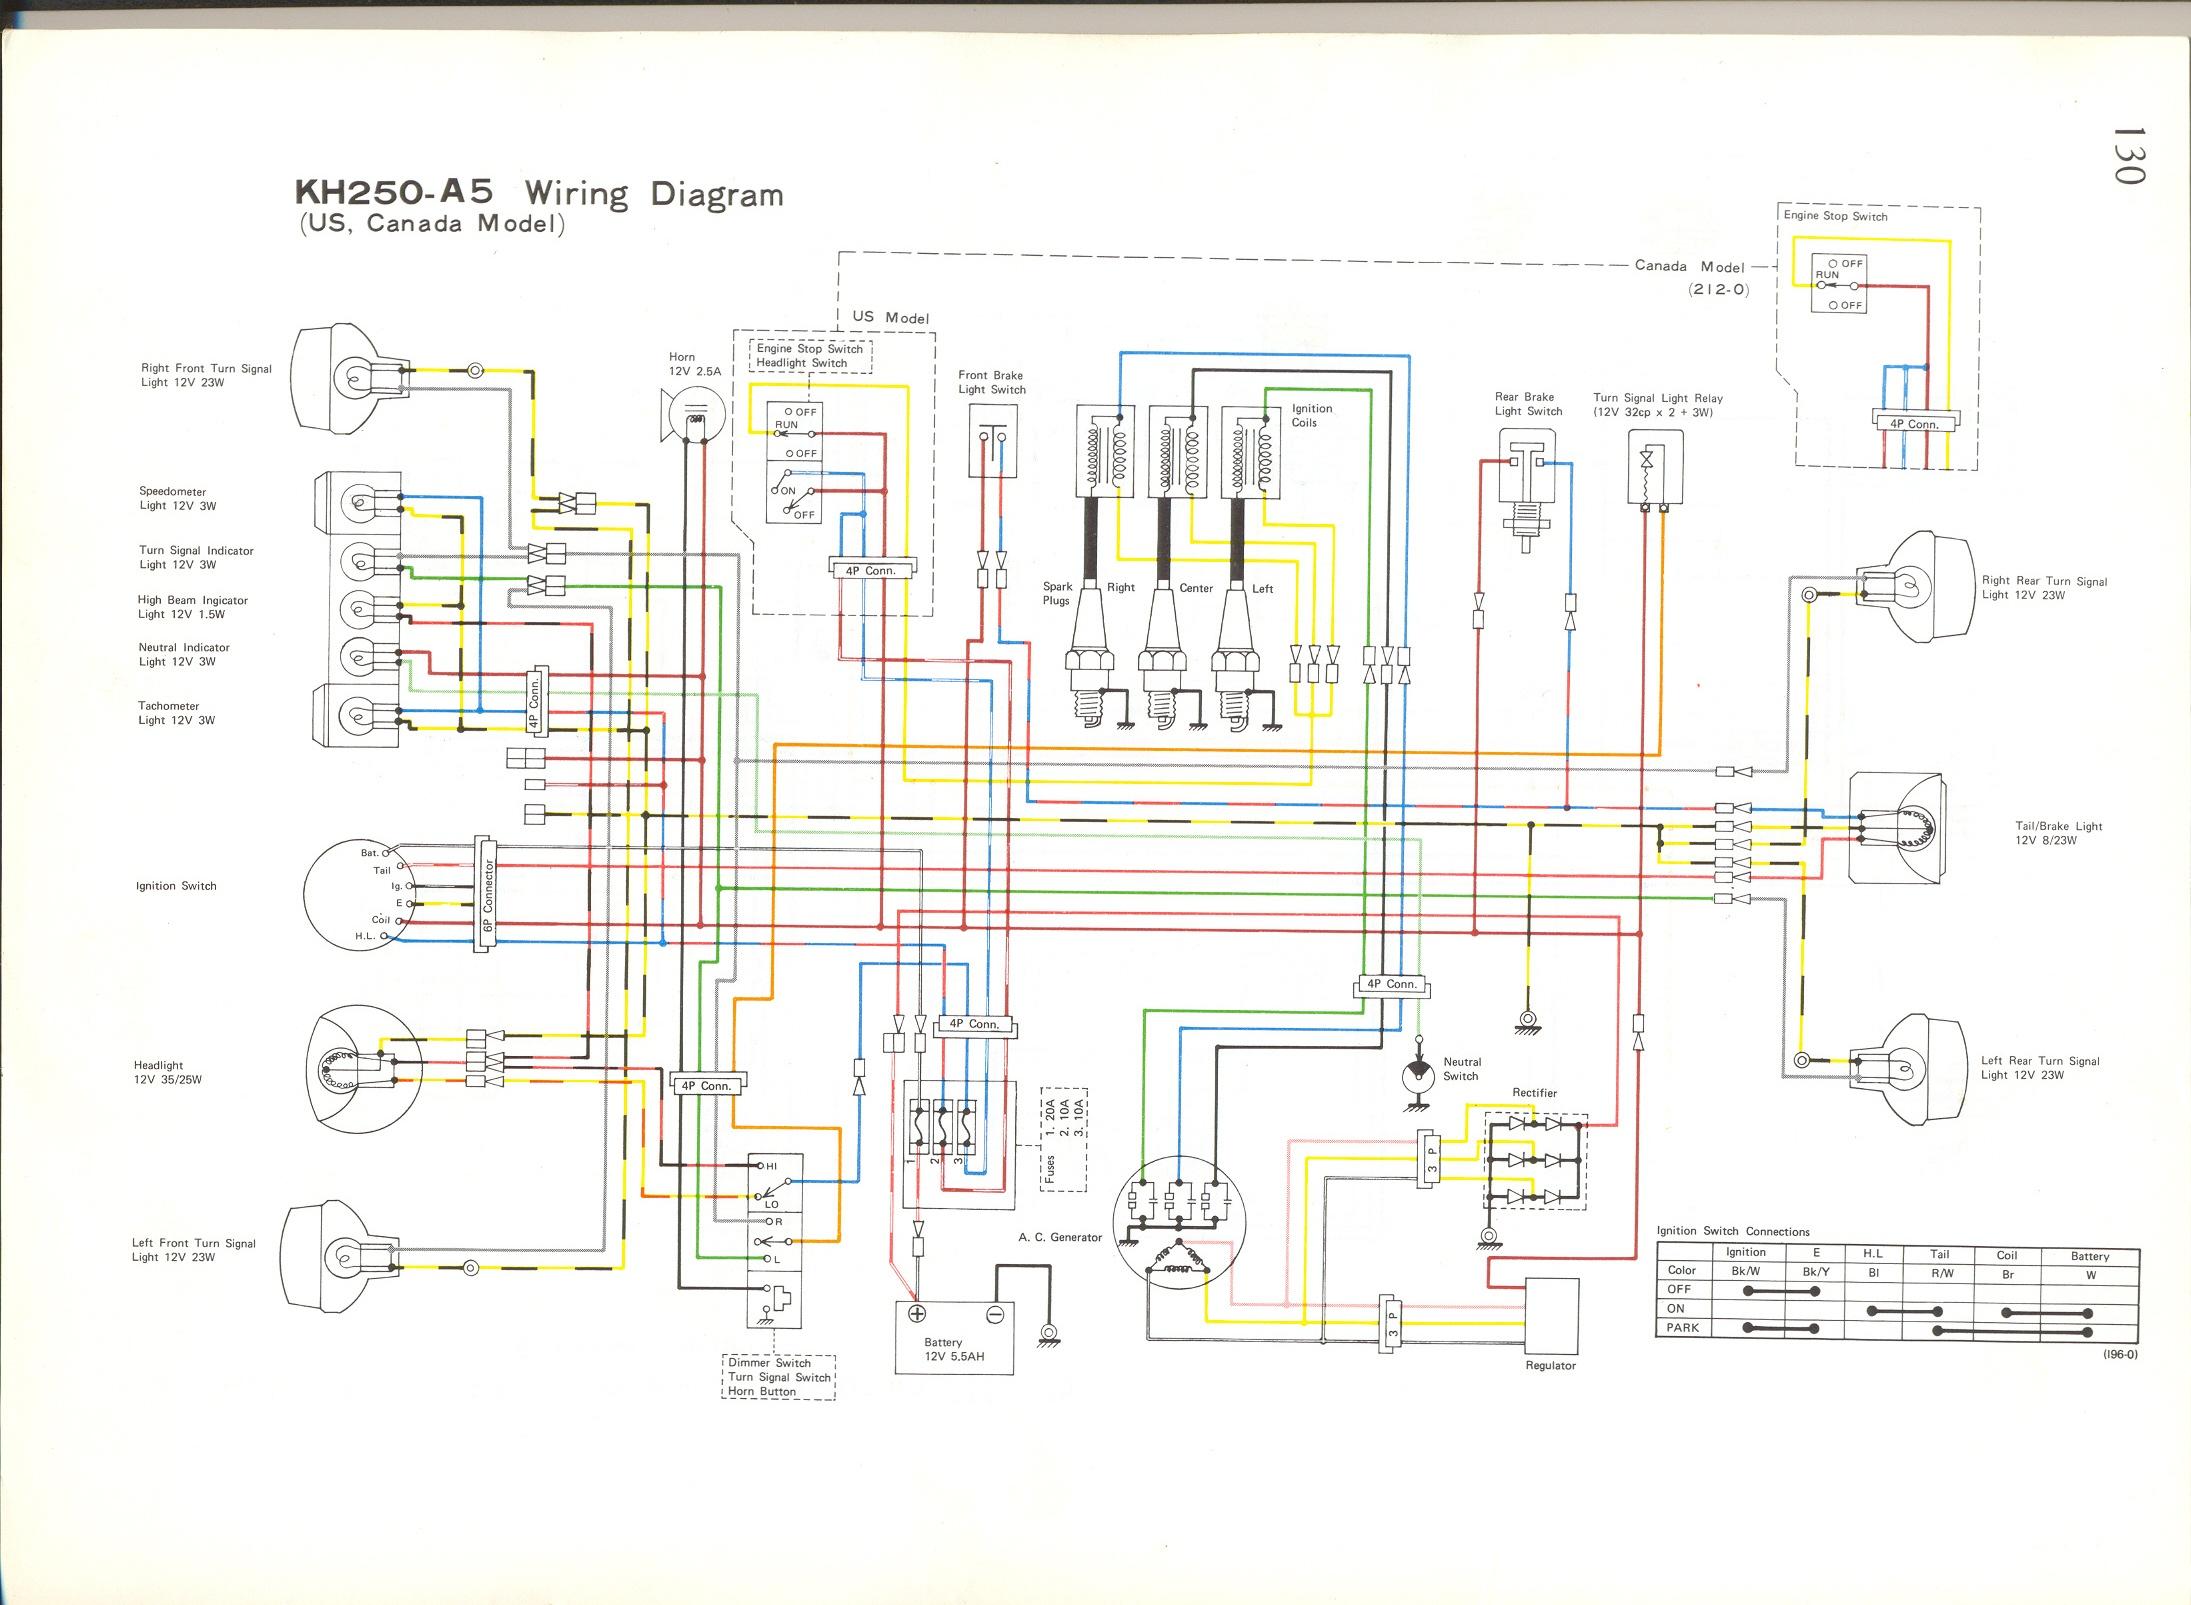 kawasaki 650 sx engine diagram jet ski kawasaki 750 sx jet